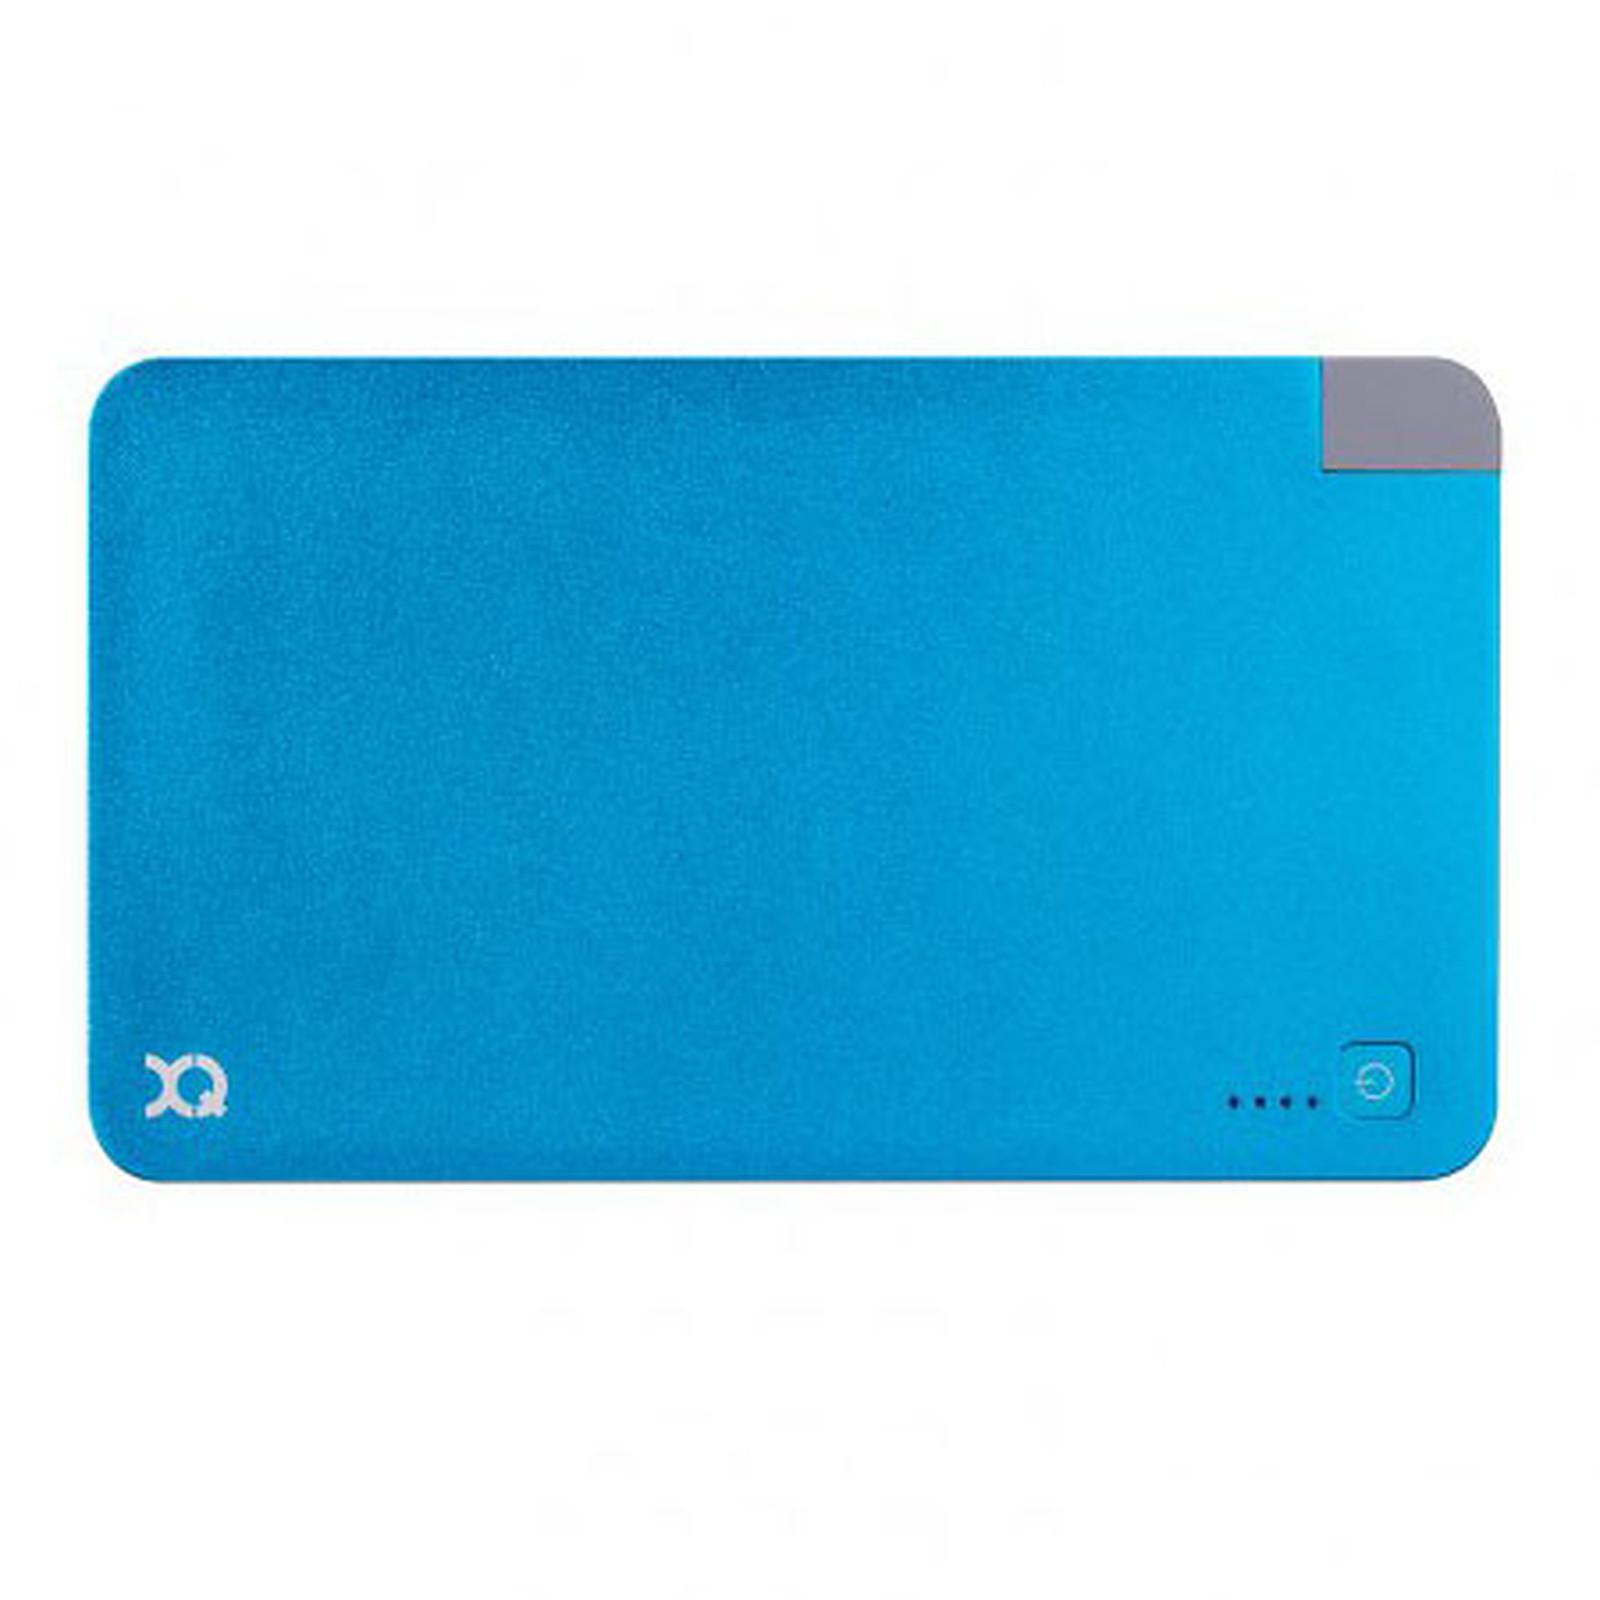 xqisit Power Bank 5000 mAh azul (Lightning)